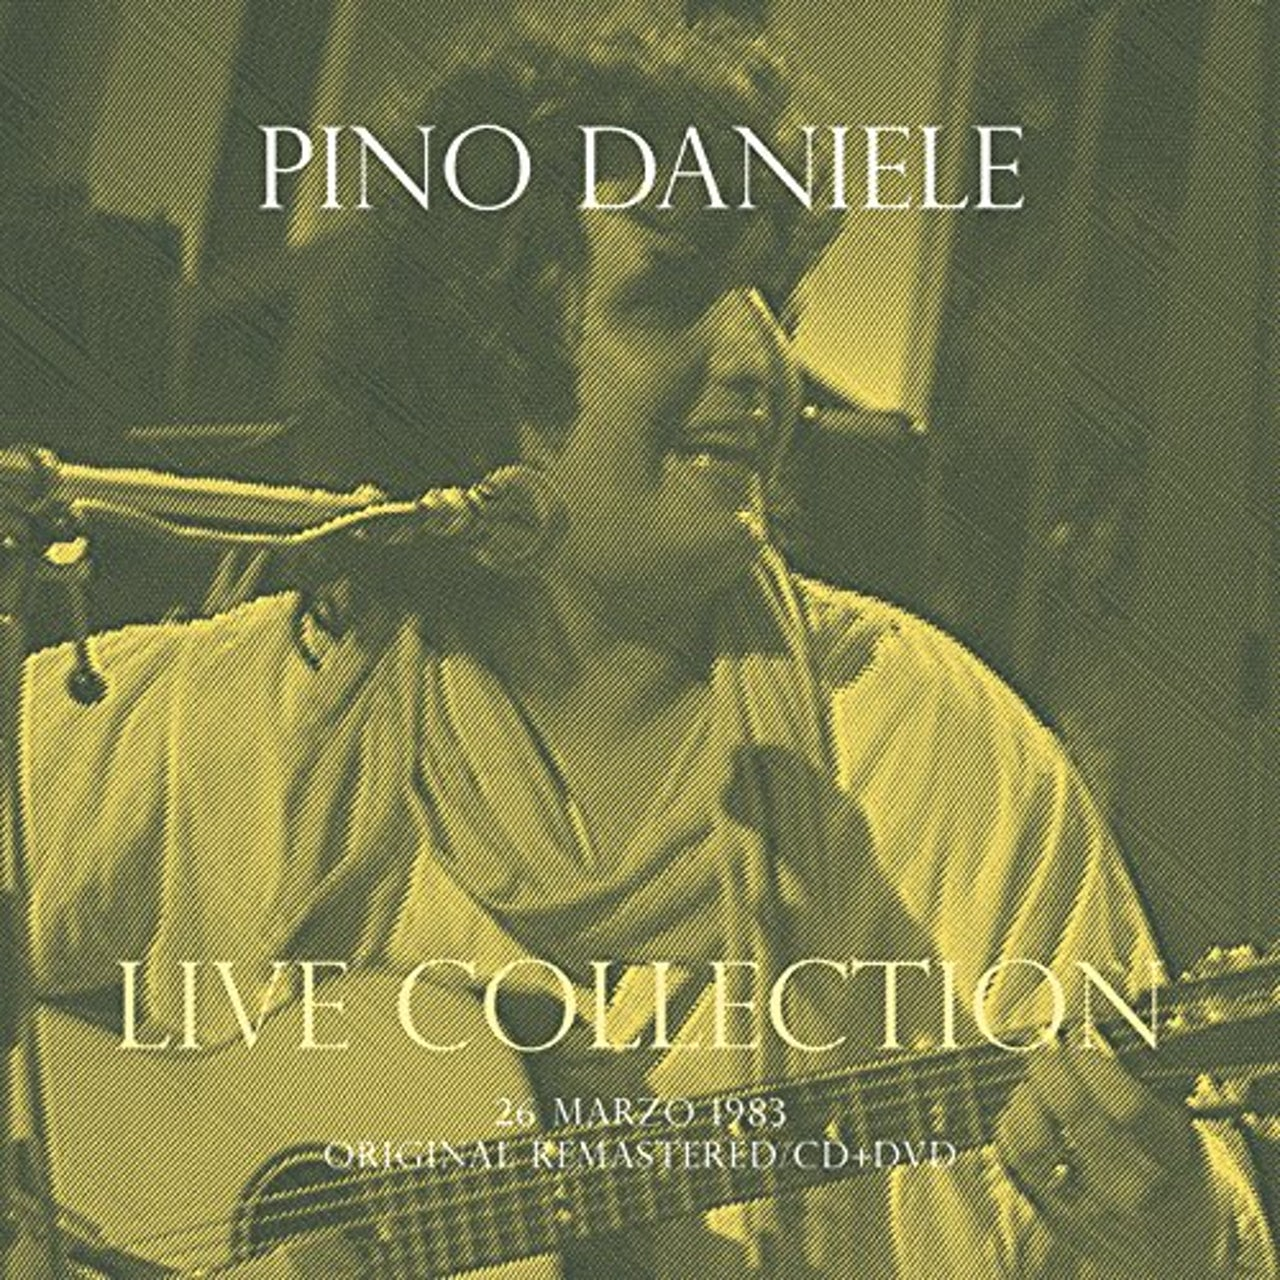 Daniele Pino CONCERTO LIVE AT RSI (26 MARZO 1983) - CD+DVD DIGI CD